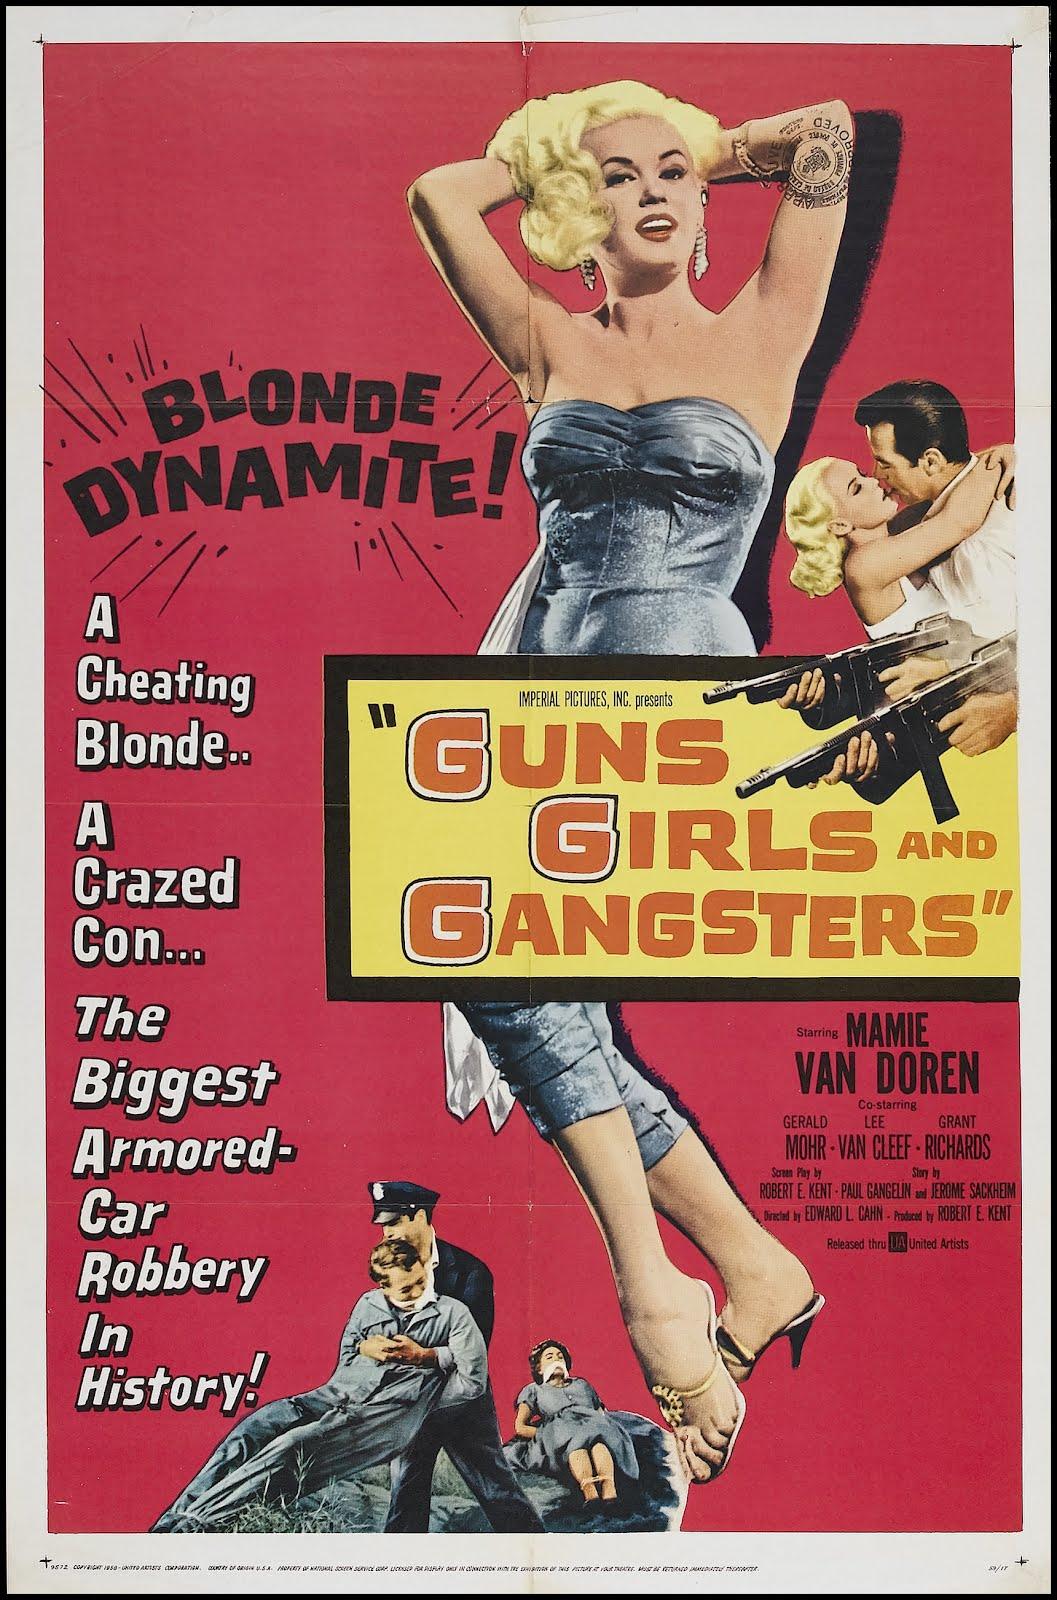 http://1.bp.blogspot.com/-ec9FdSPVnek/V91e-DgtL-I/AAAAAAAAAZ8/Y8eDcDhs_4U_SvTEcQ8PVvo7QX5qOEomwCK4B/s1600/guns.girls.gangsters-1959.jpg